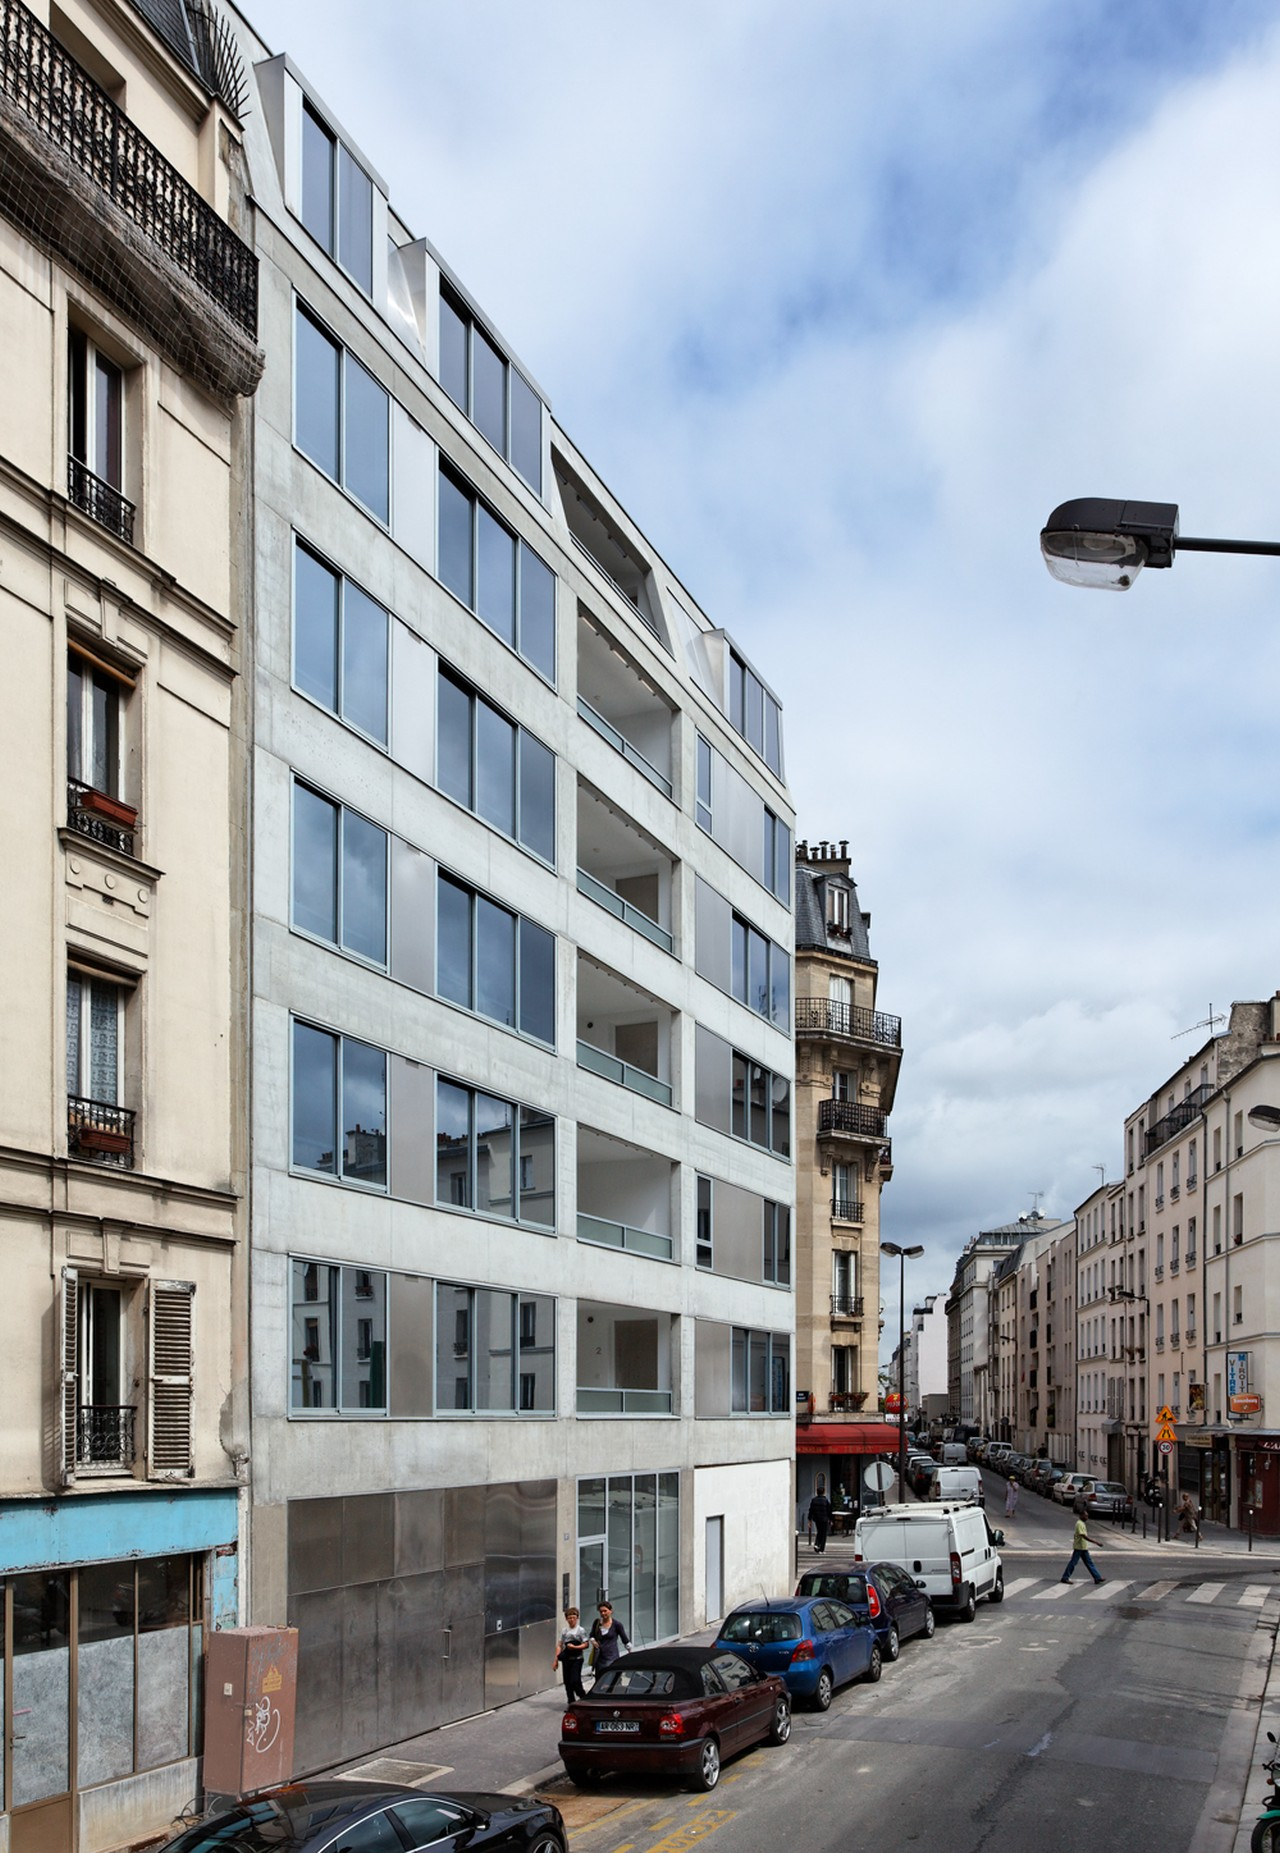 10 Dwellings in Pajol / Bourbouze & Graindorge